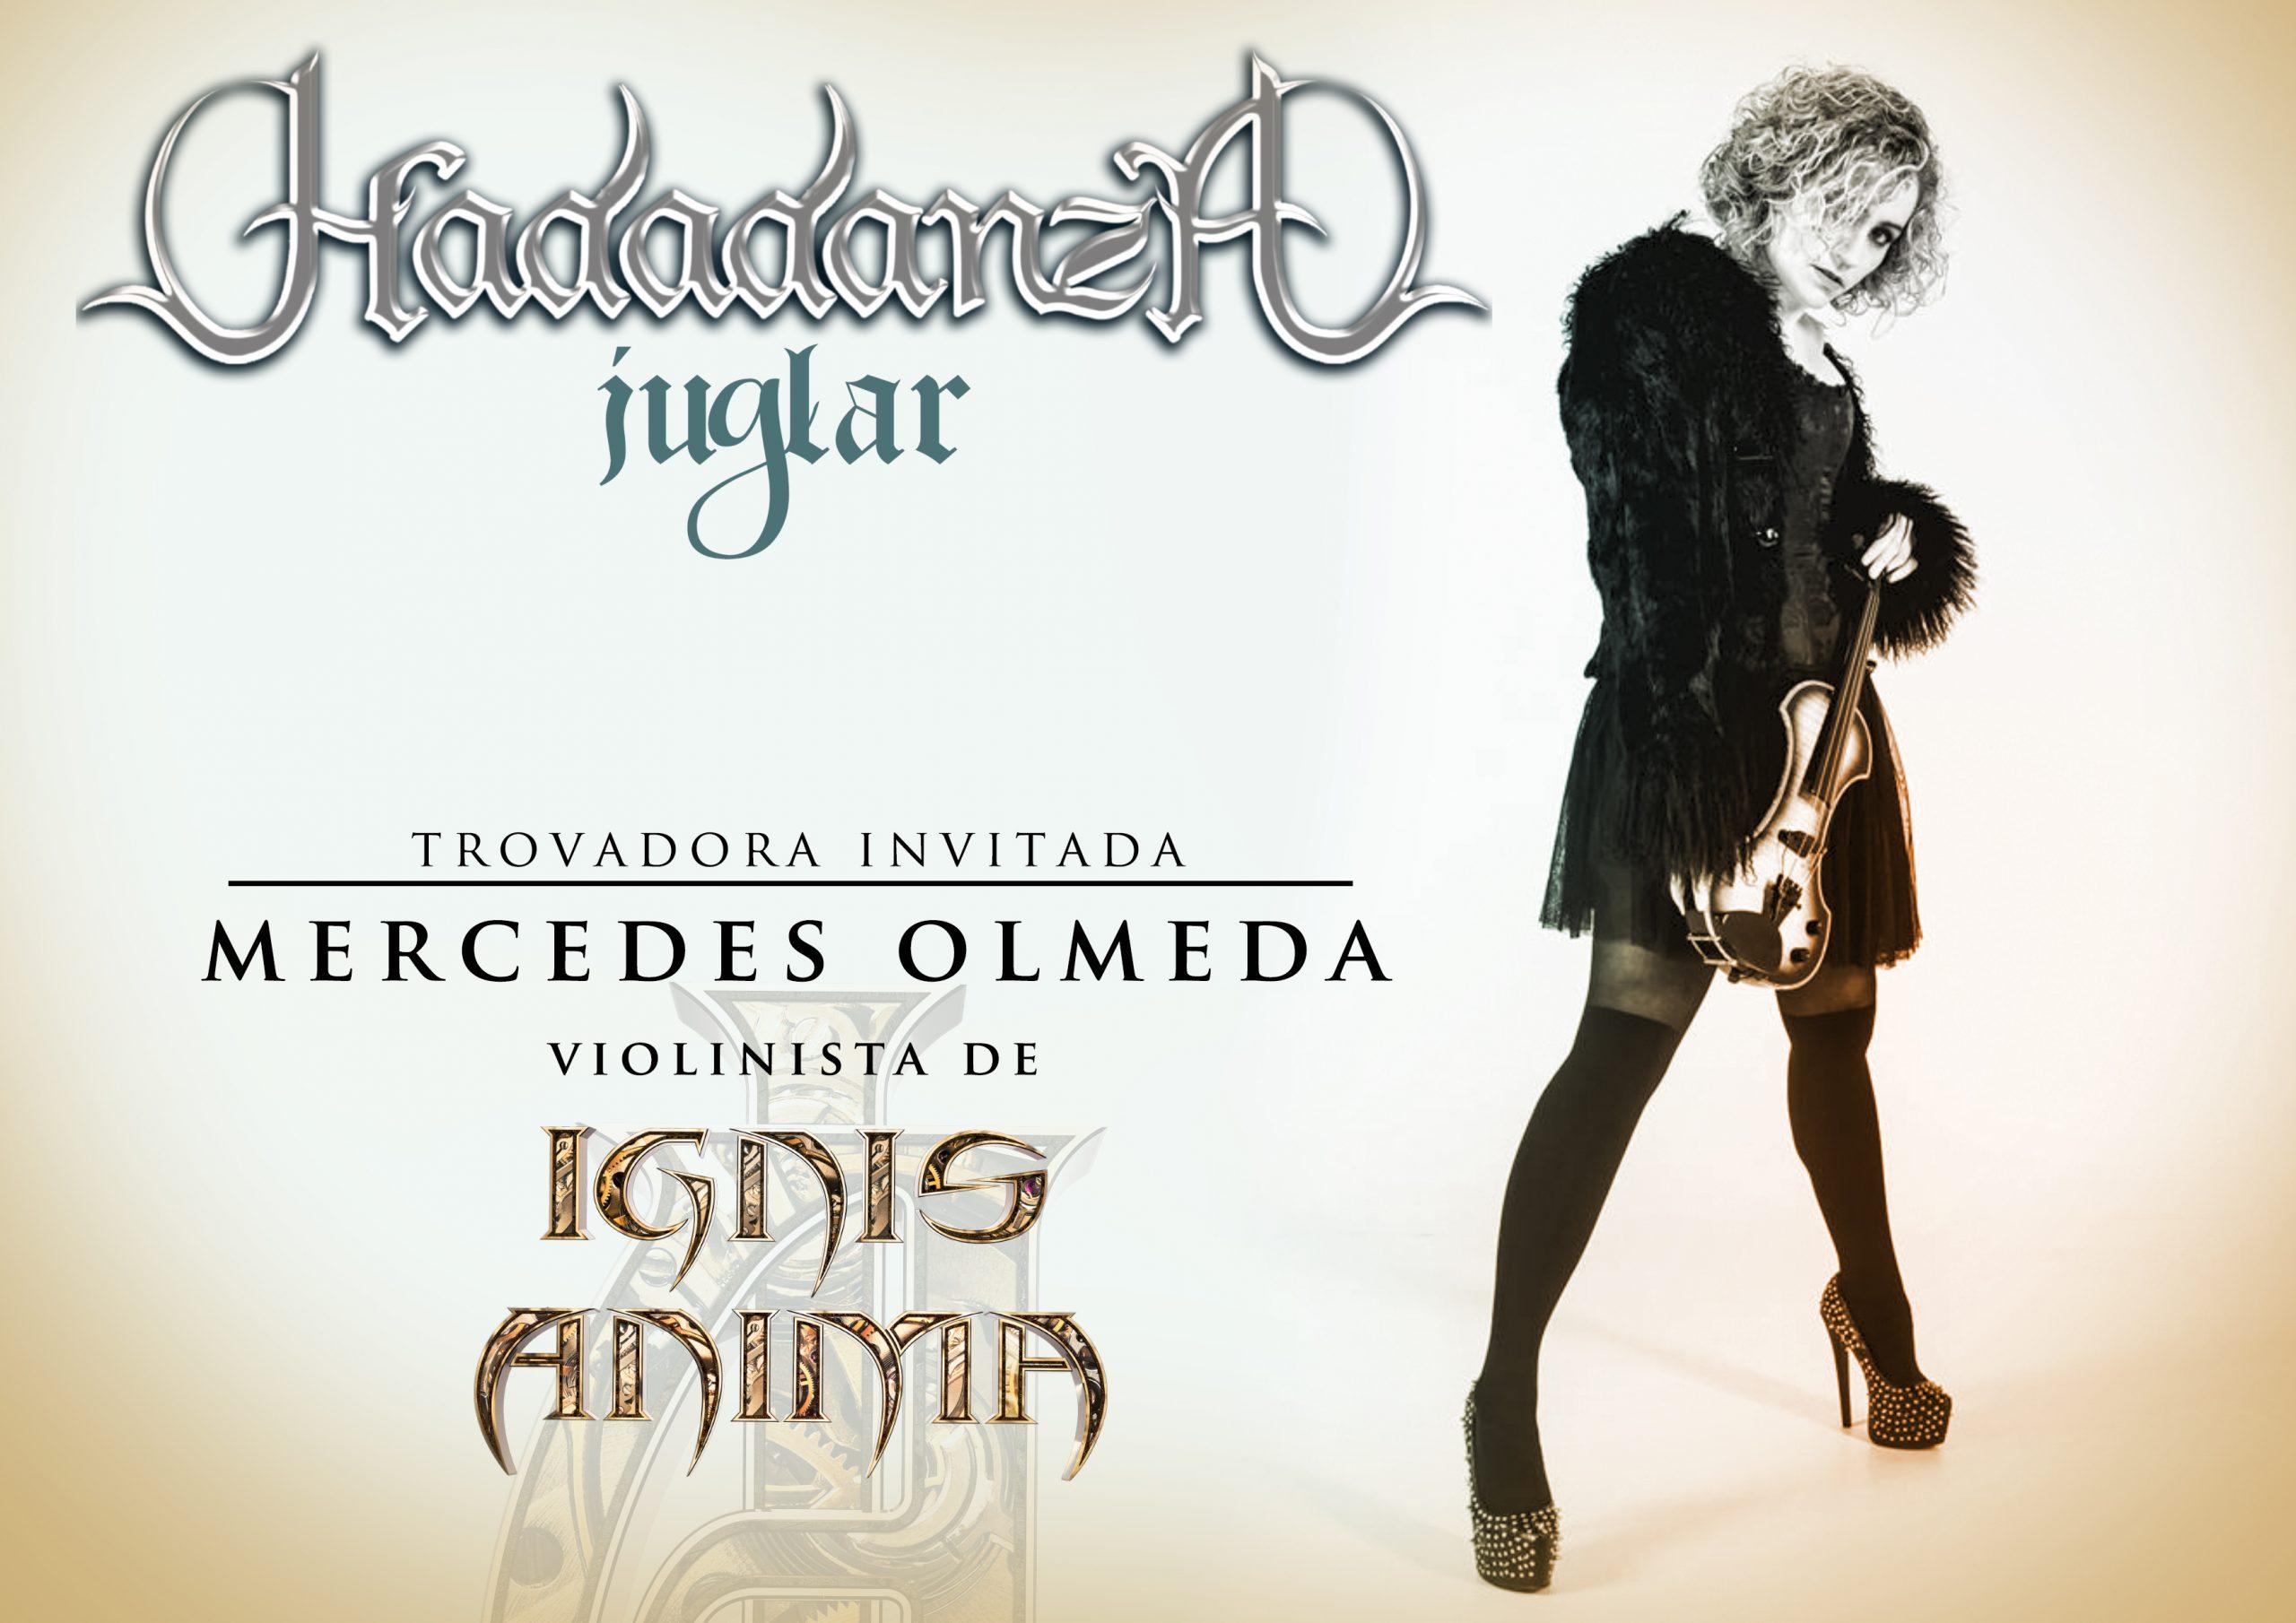 FOLK METAL ROCK - MERCEDES OLMEDA EN JUGLAR